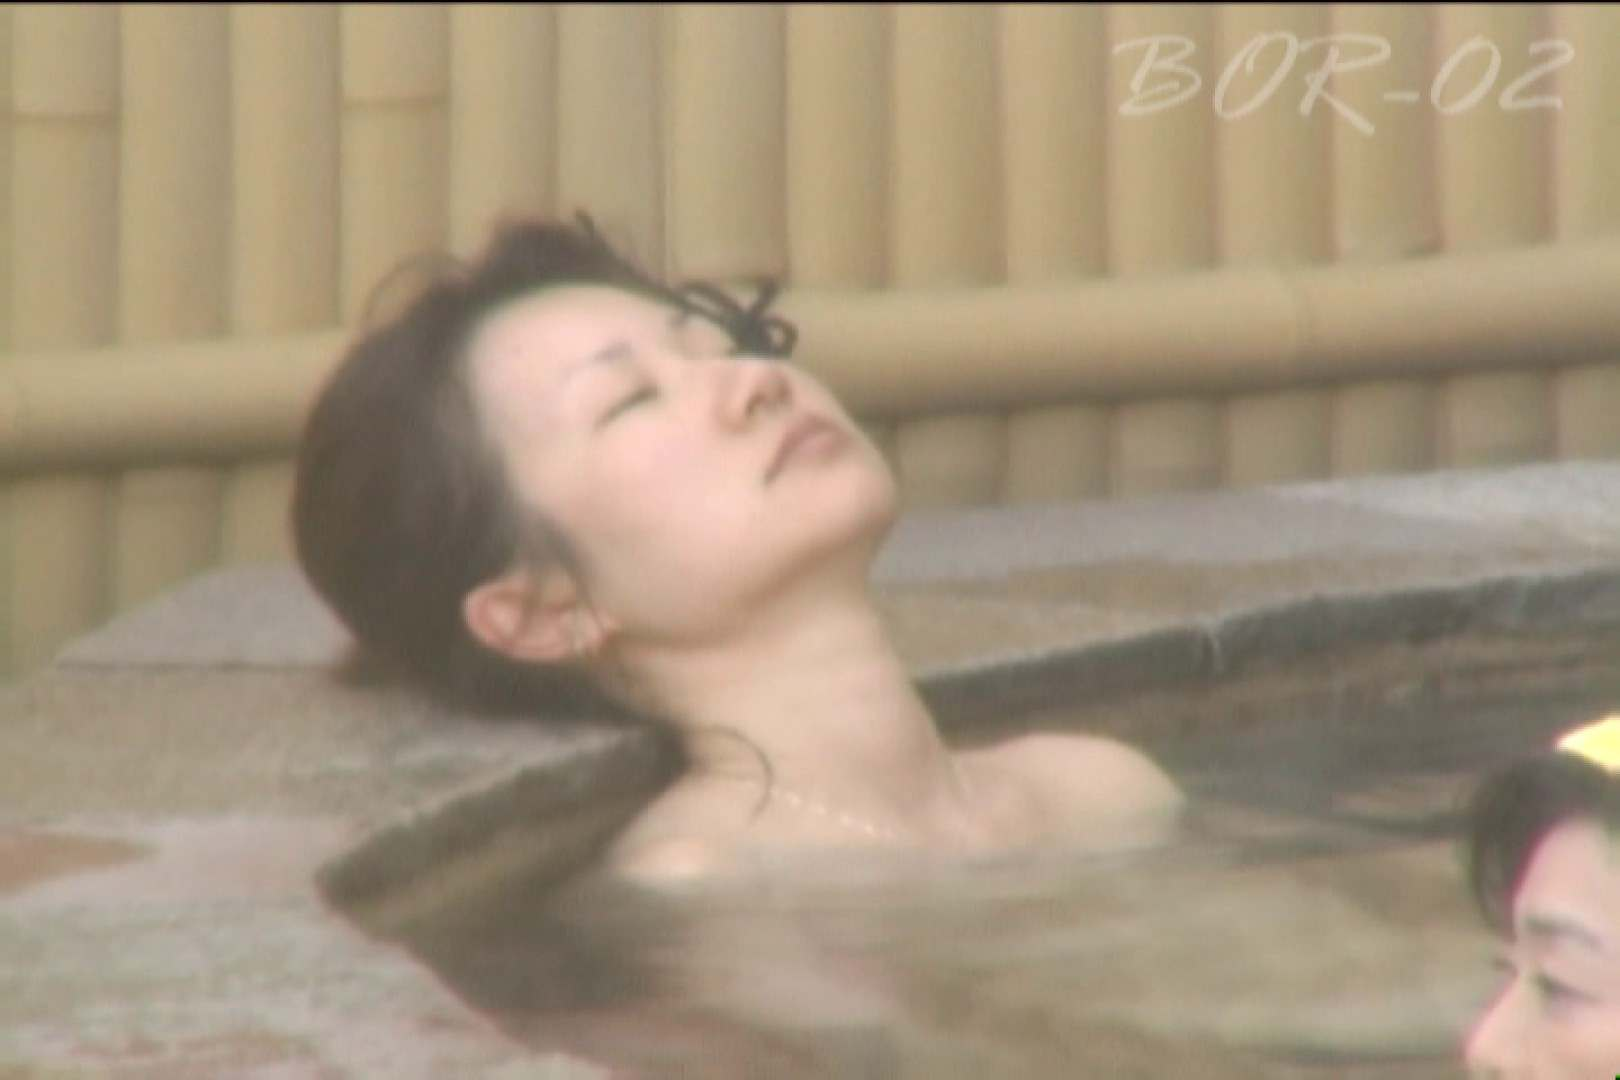 Aquaな露天風呂Vol.477 盗撮   OLエロ画像  99PICs 40